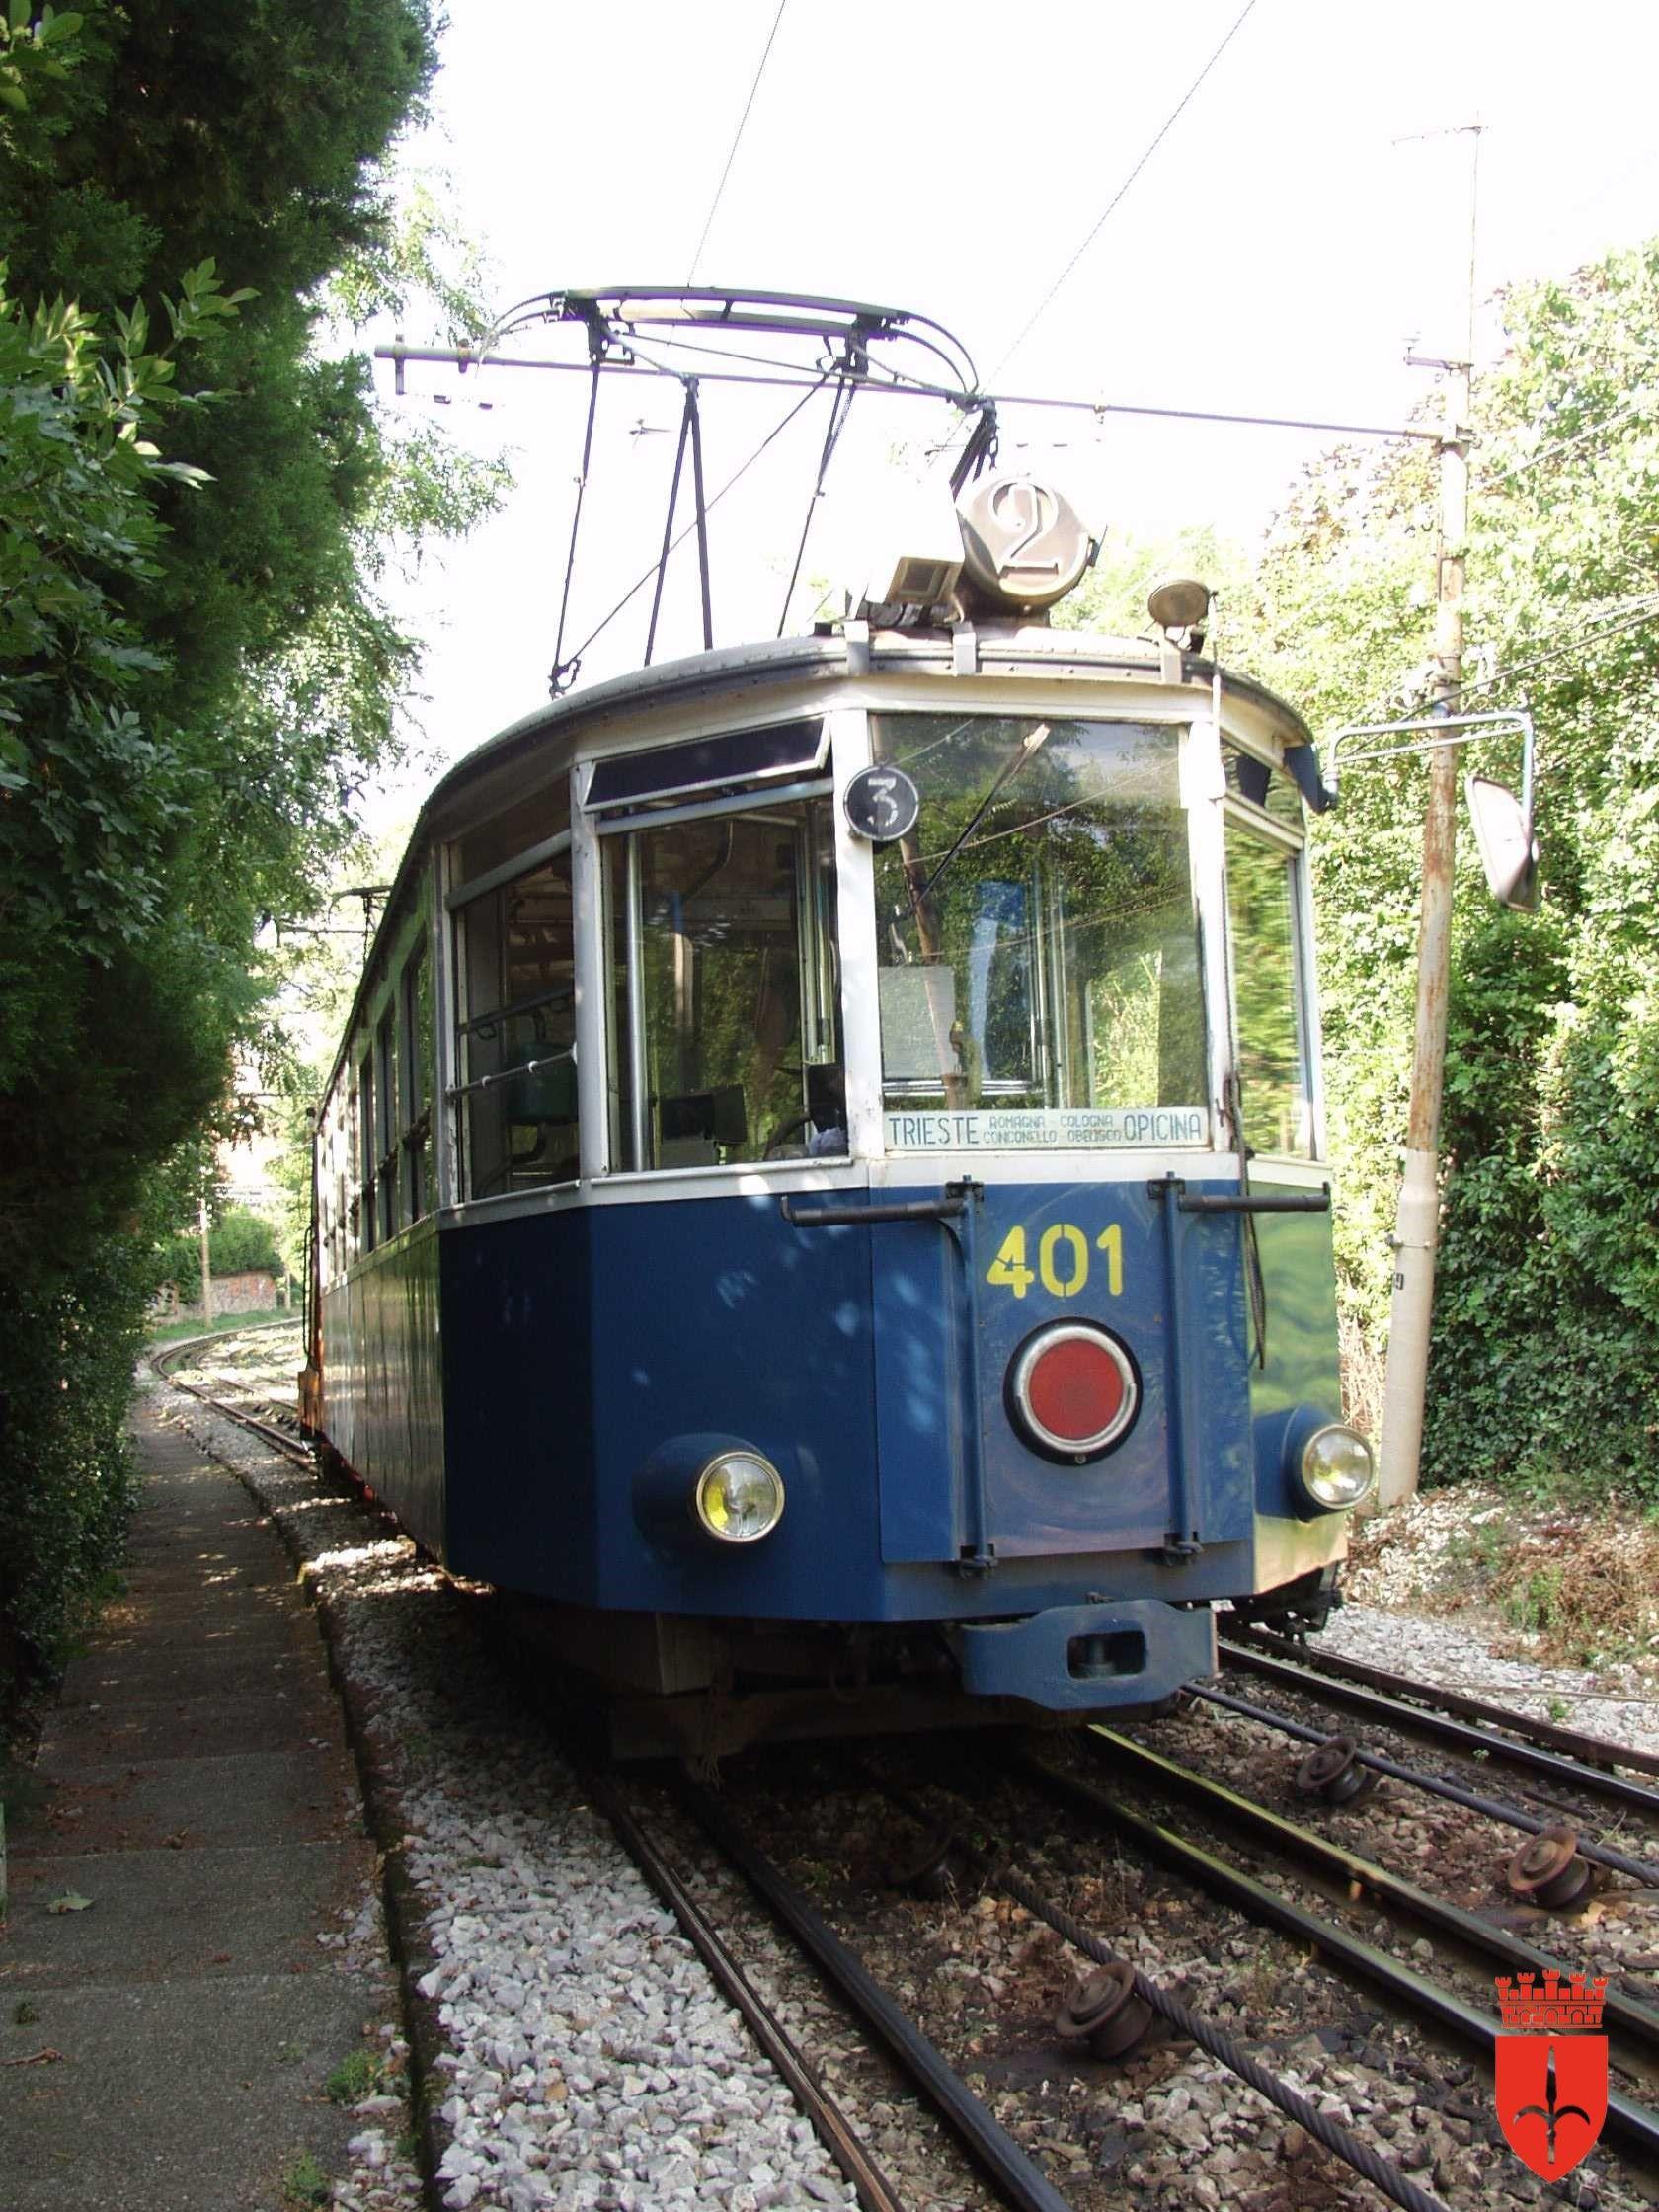 Tram di Opicina La linea storica a trazione elettrica